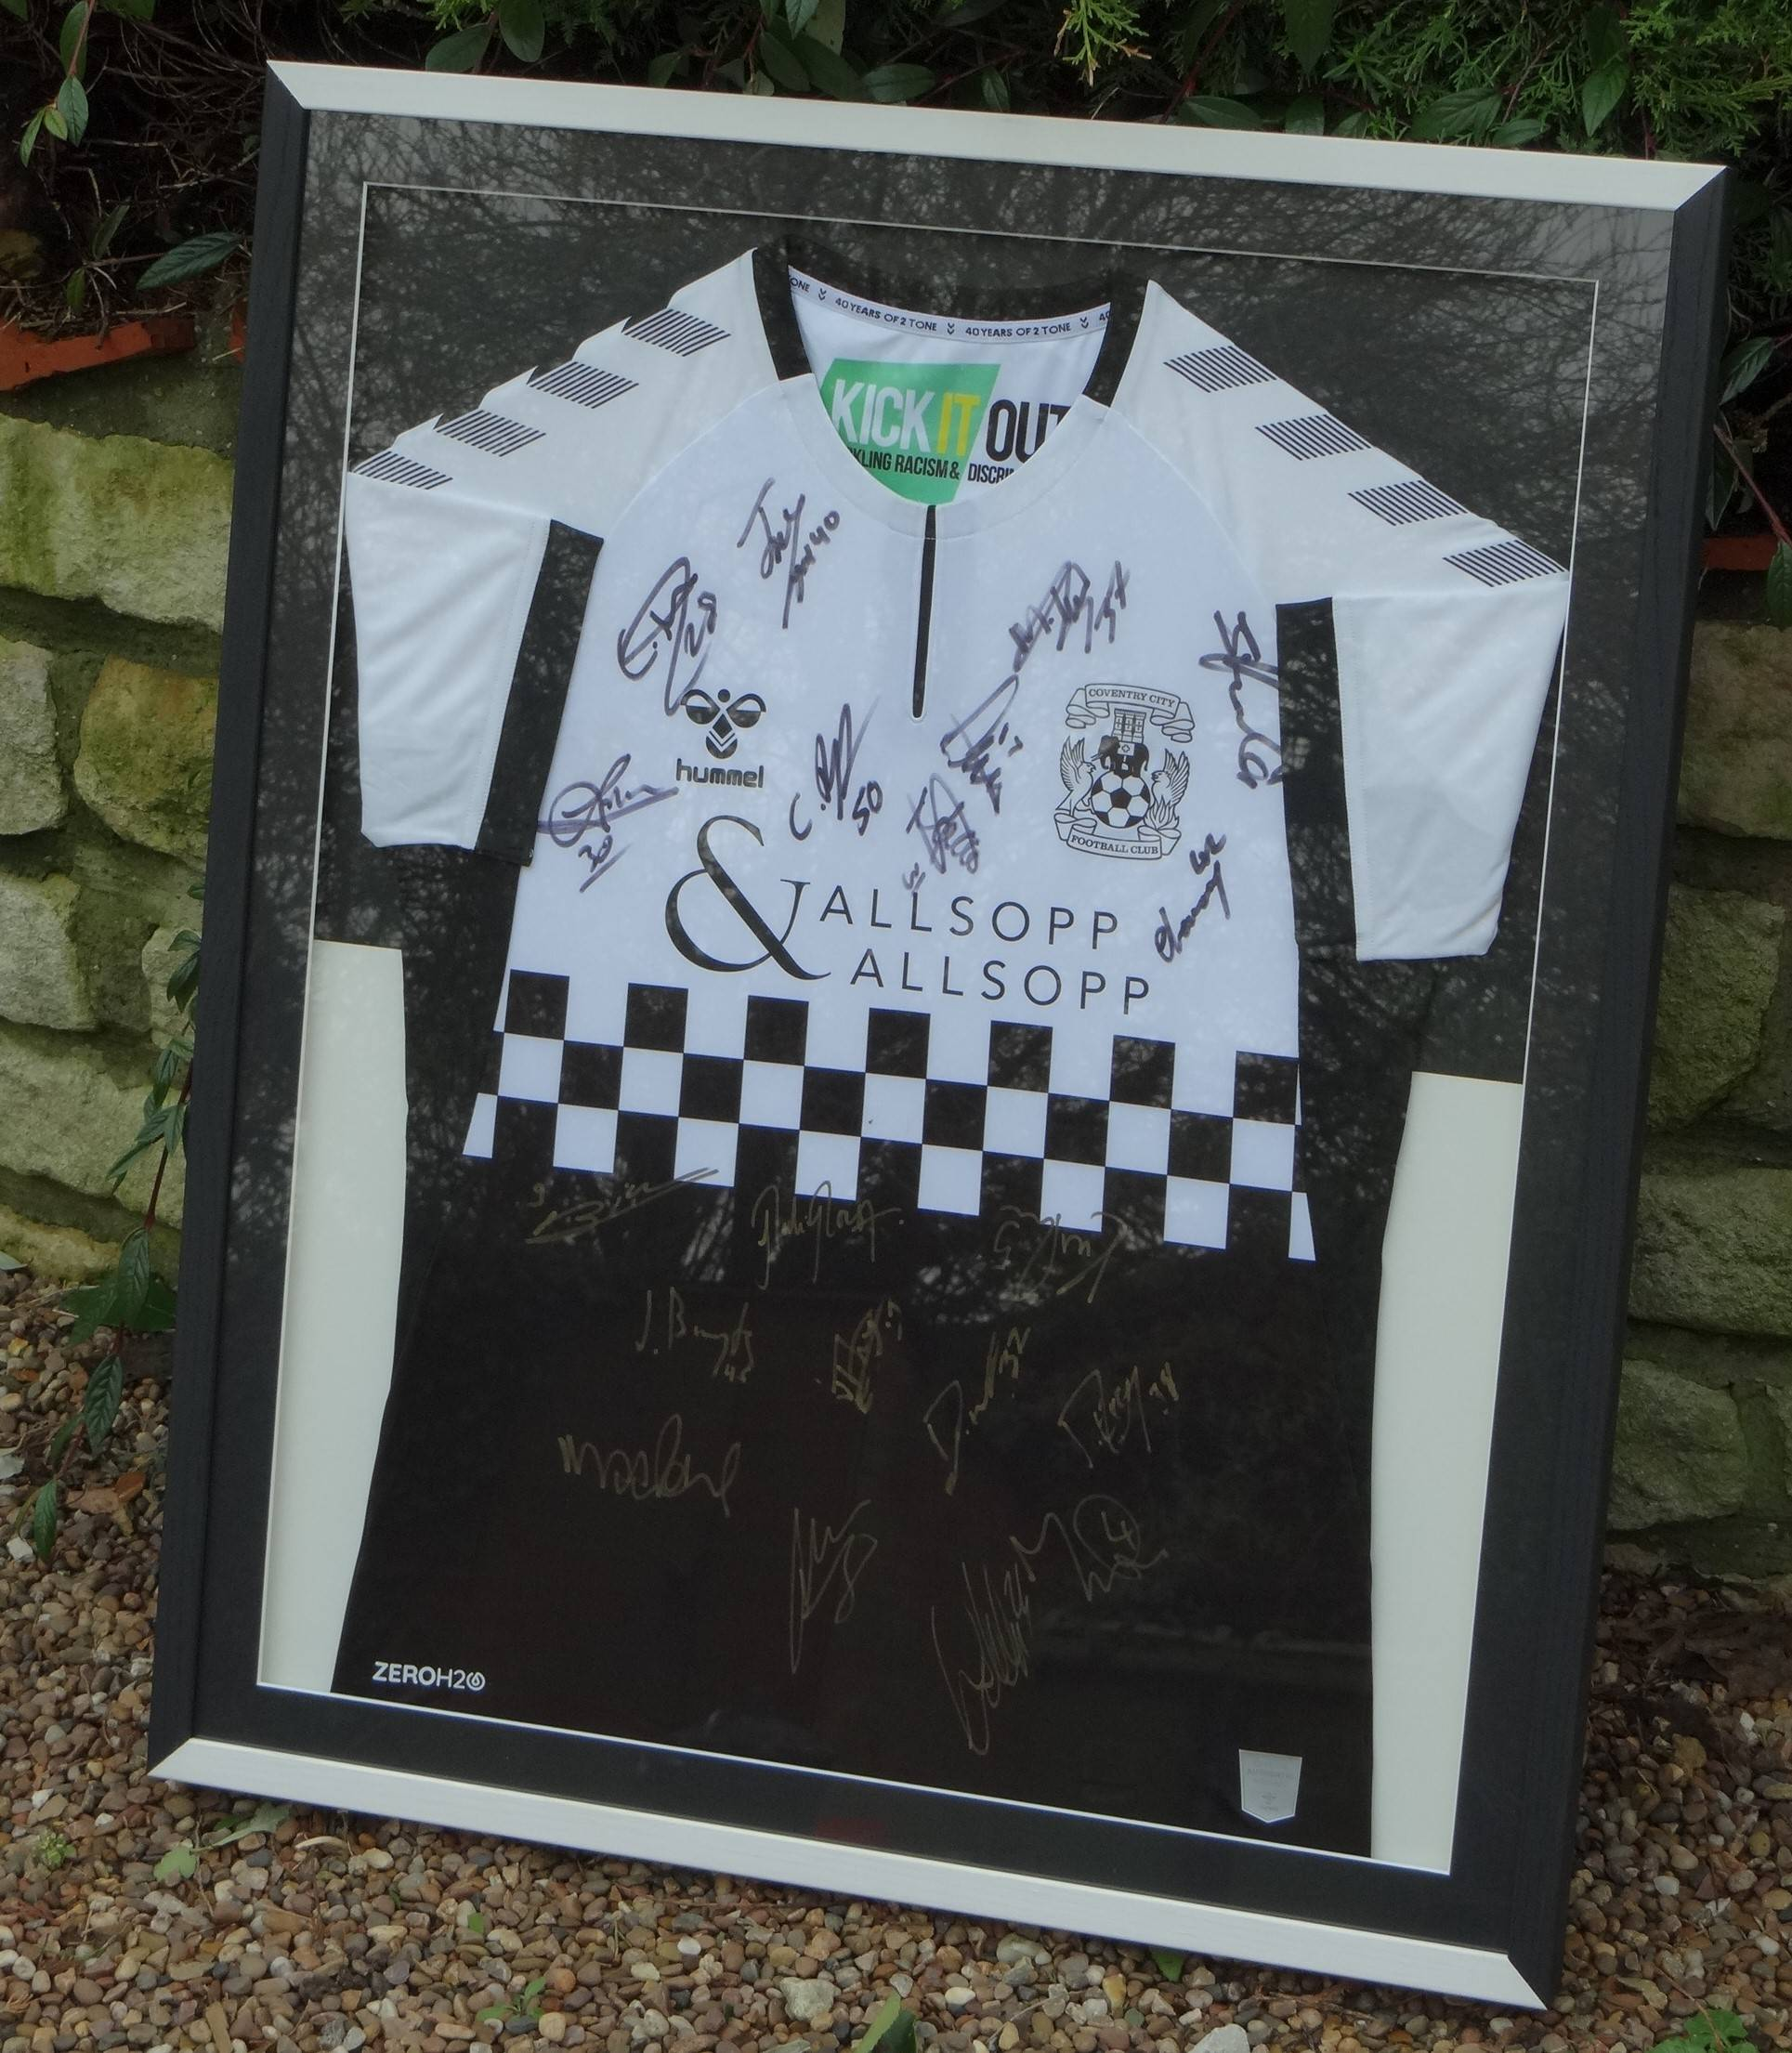 Coventry City 2-Tone shirt.